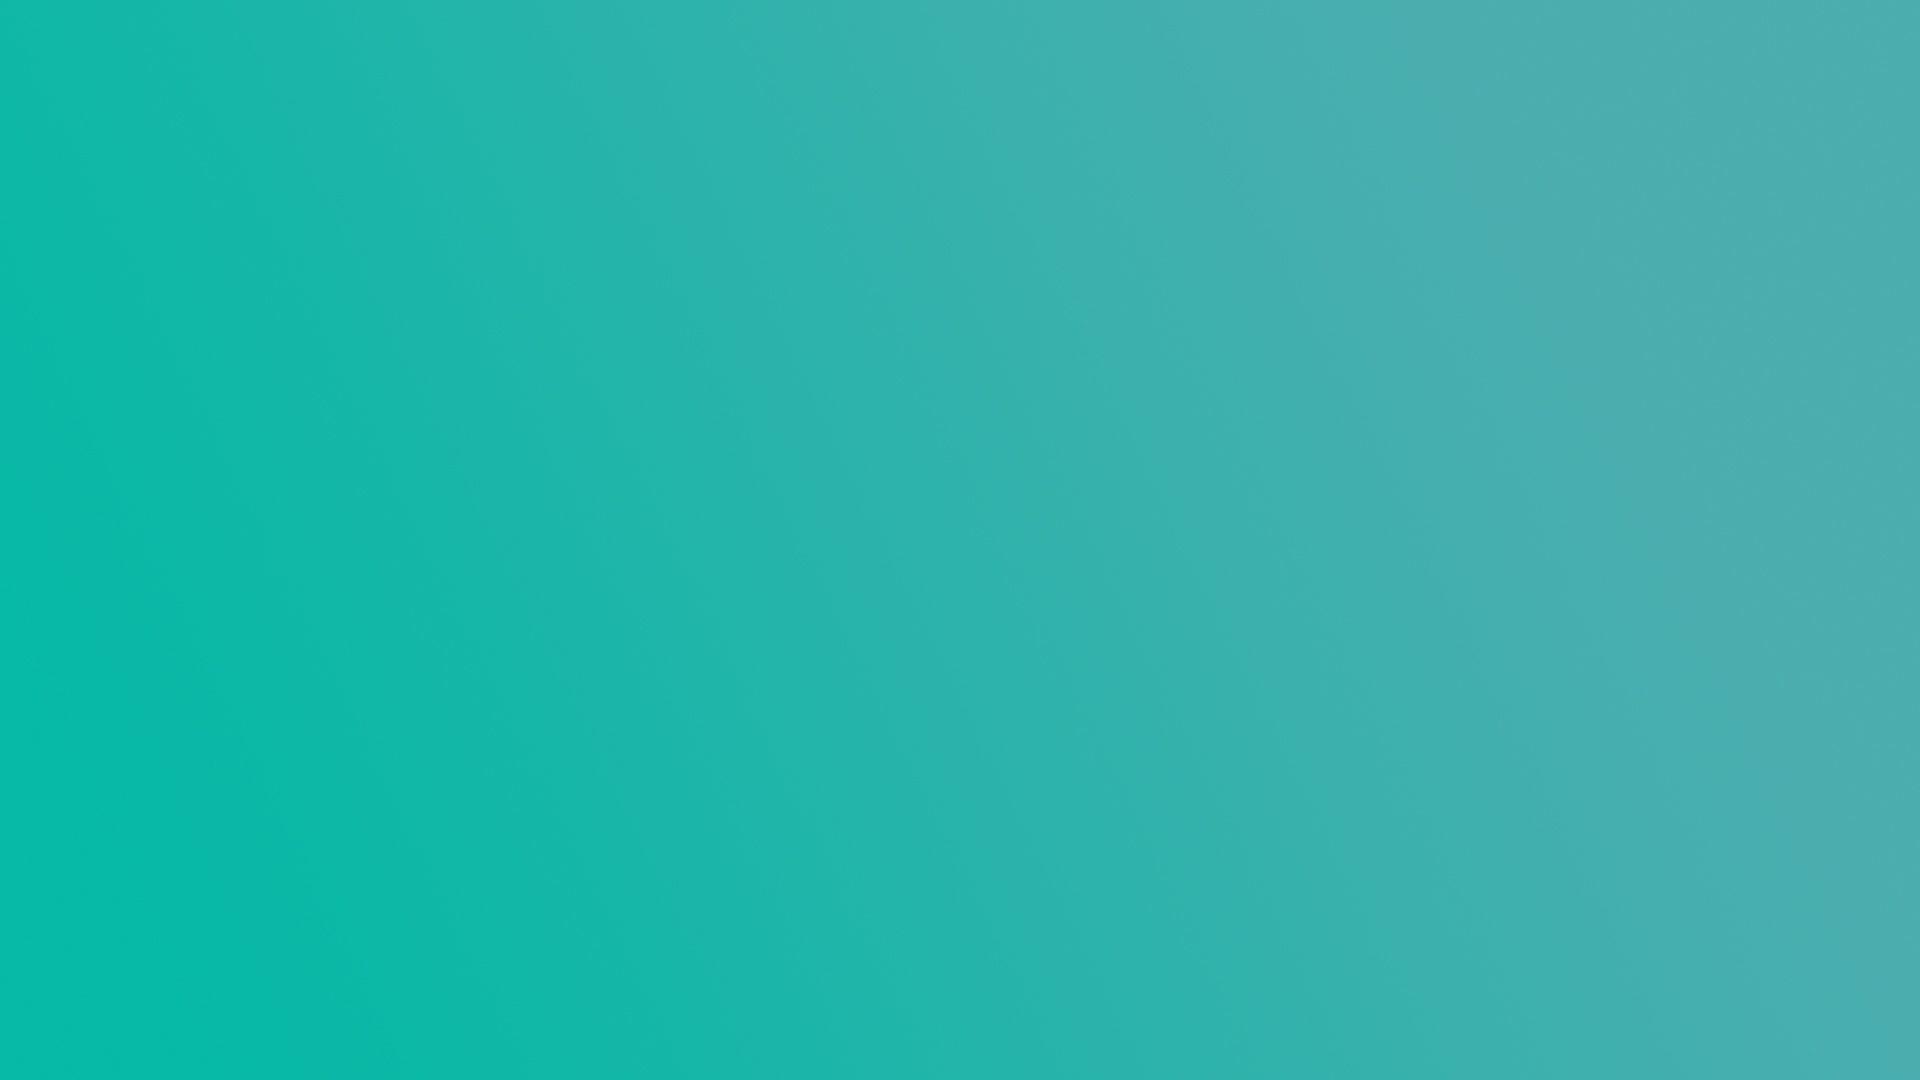 Alienware Wallpaper Hd 1920x1080 Plain Blue Screen Wallpaper 1920x1080 183 ①